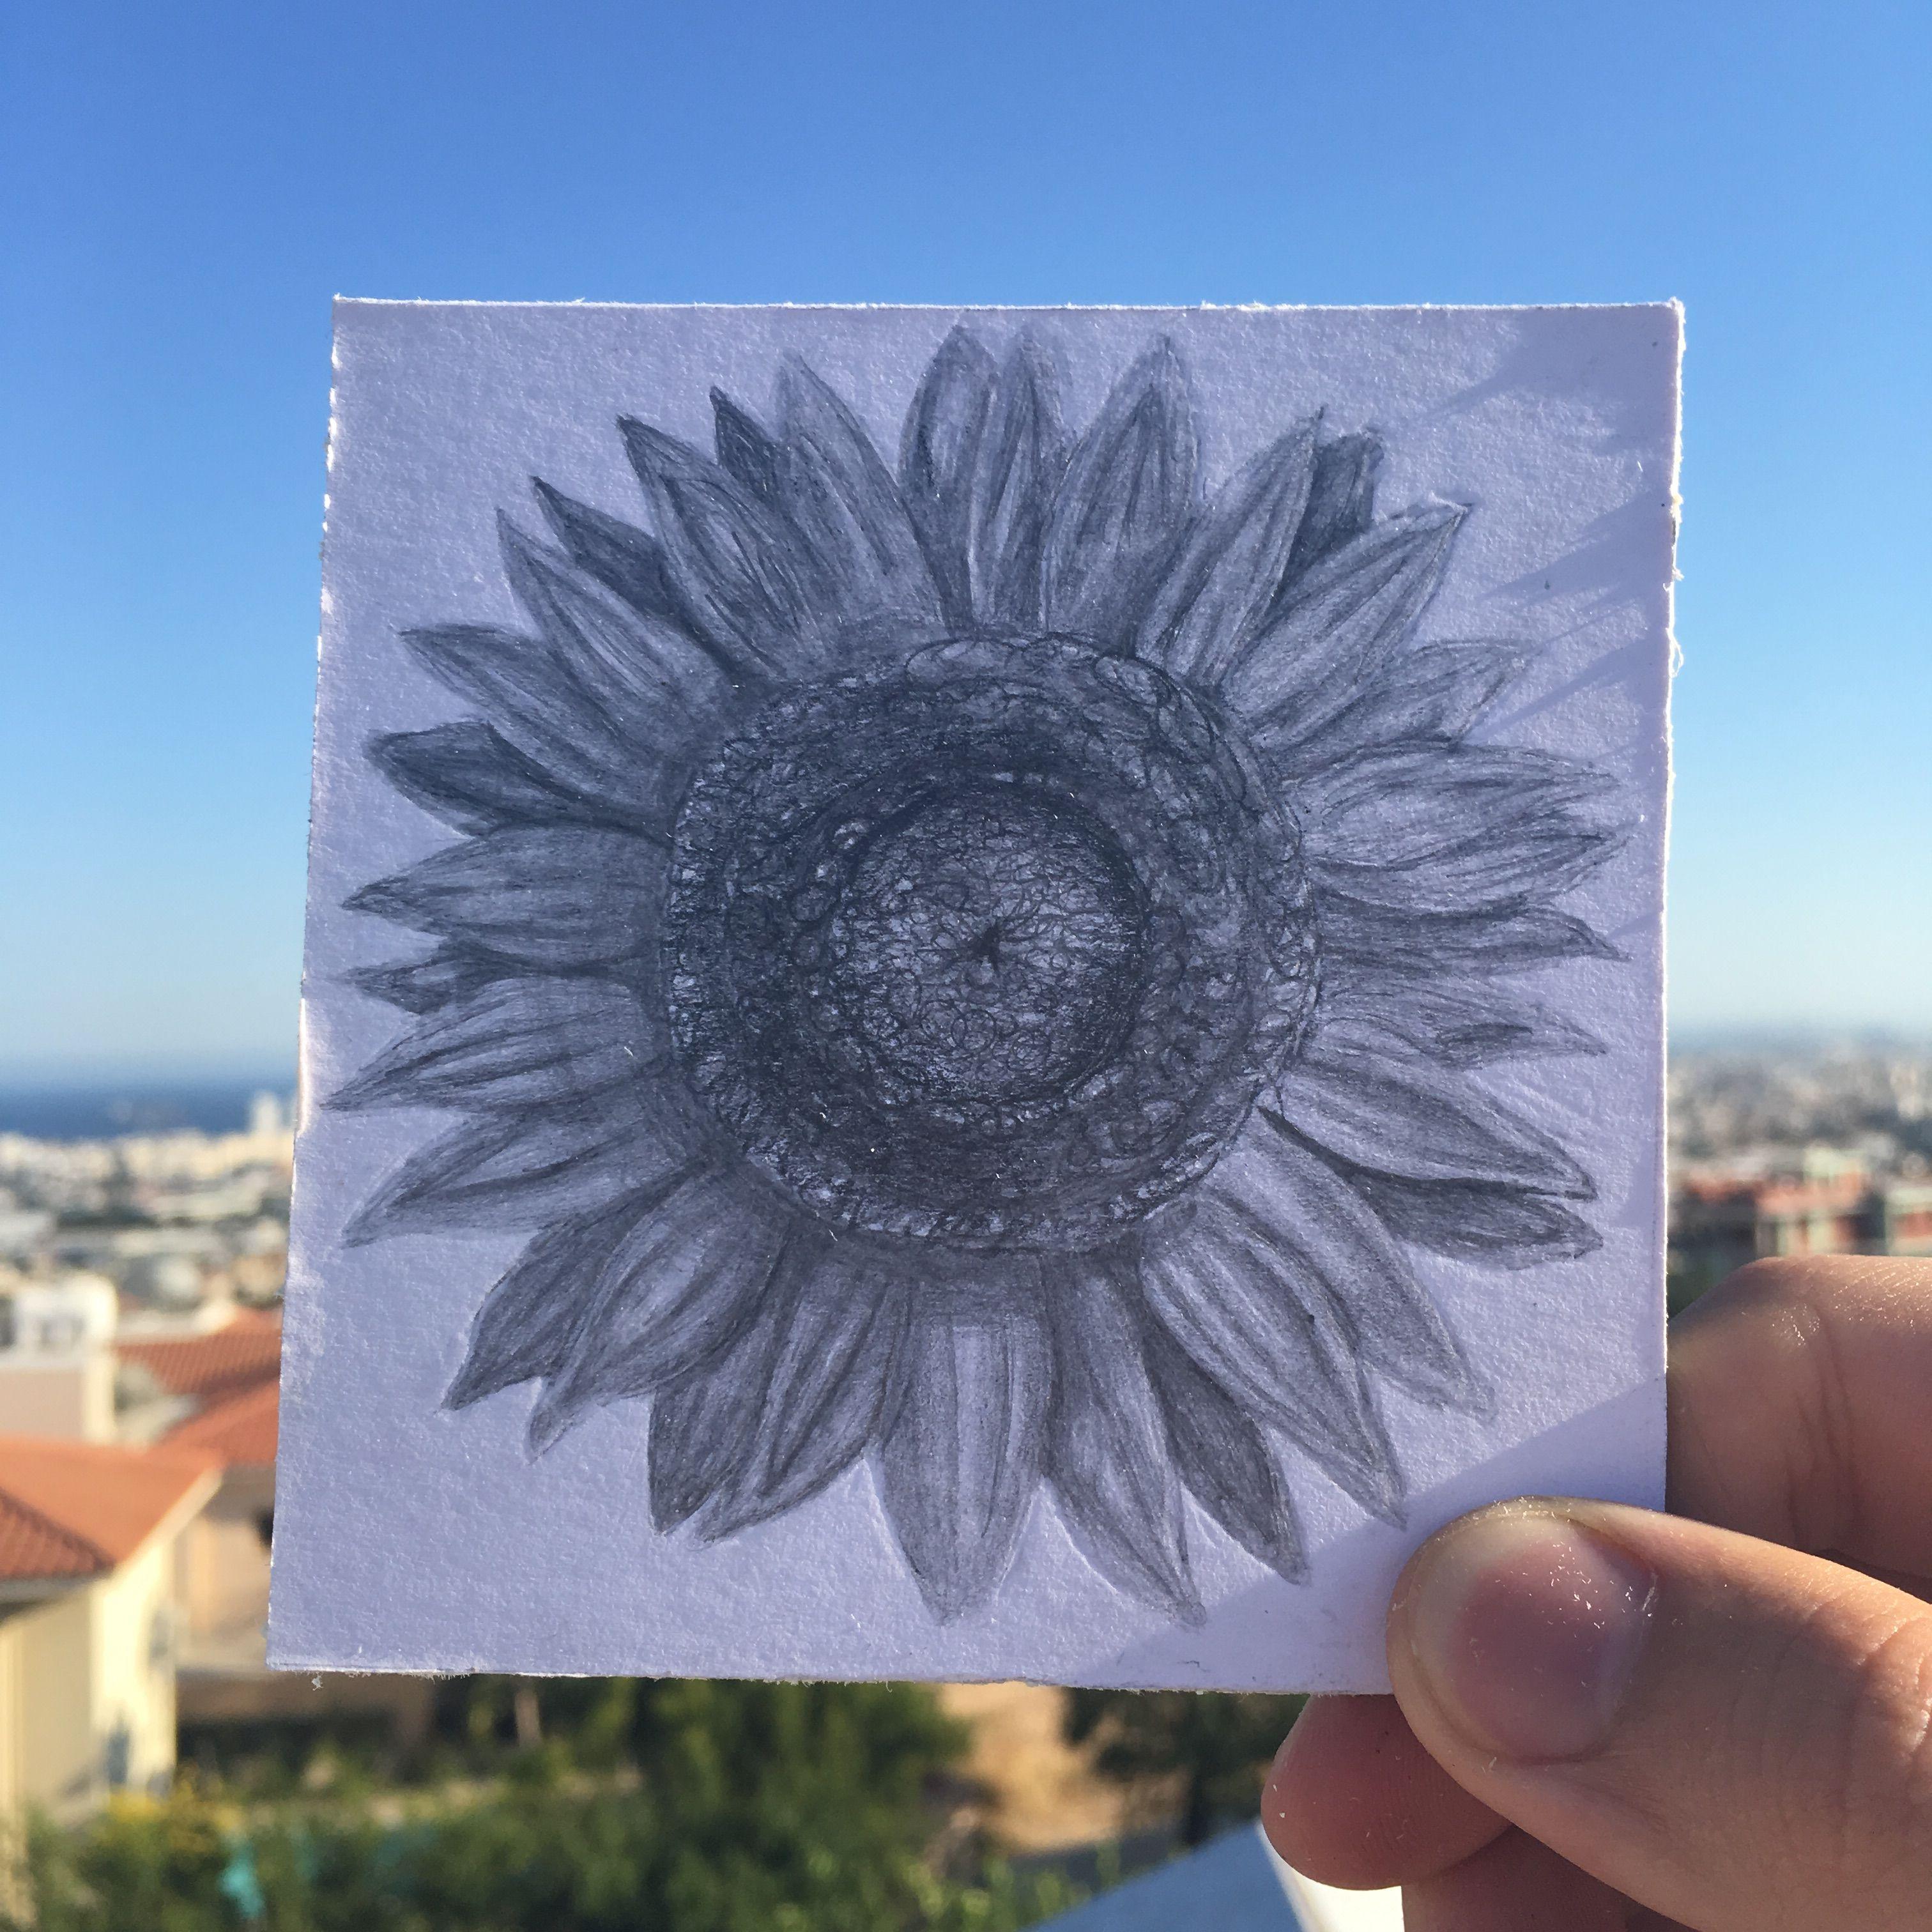 Sunflower, Iliou